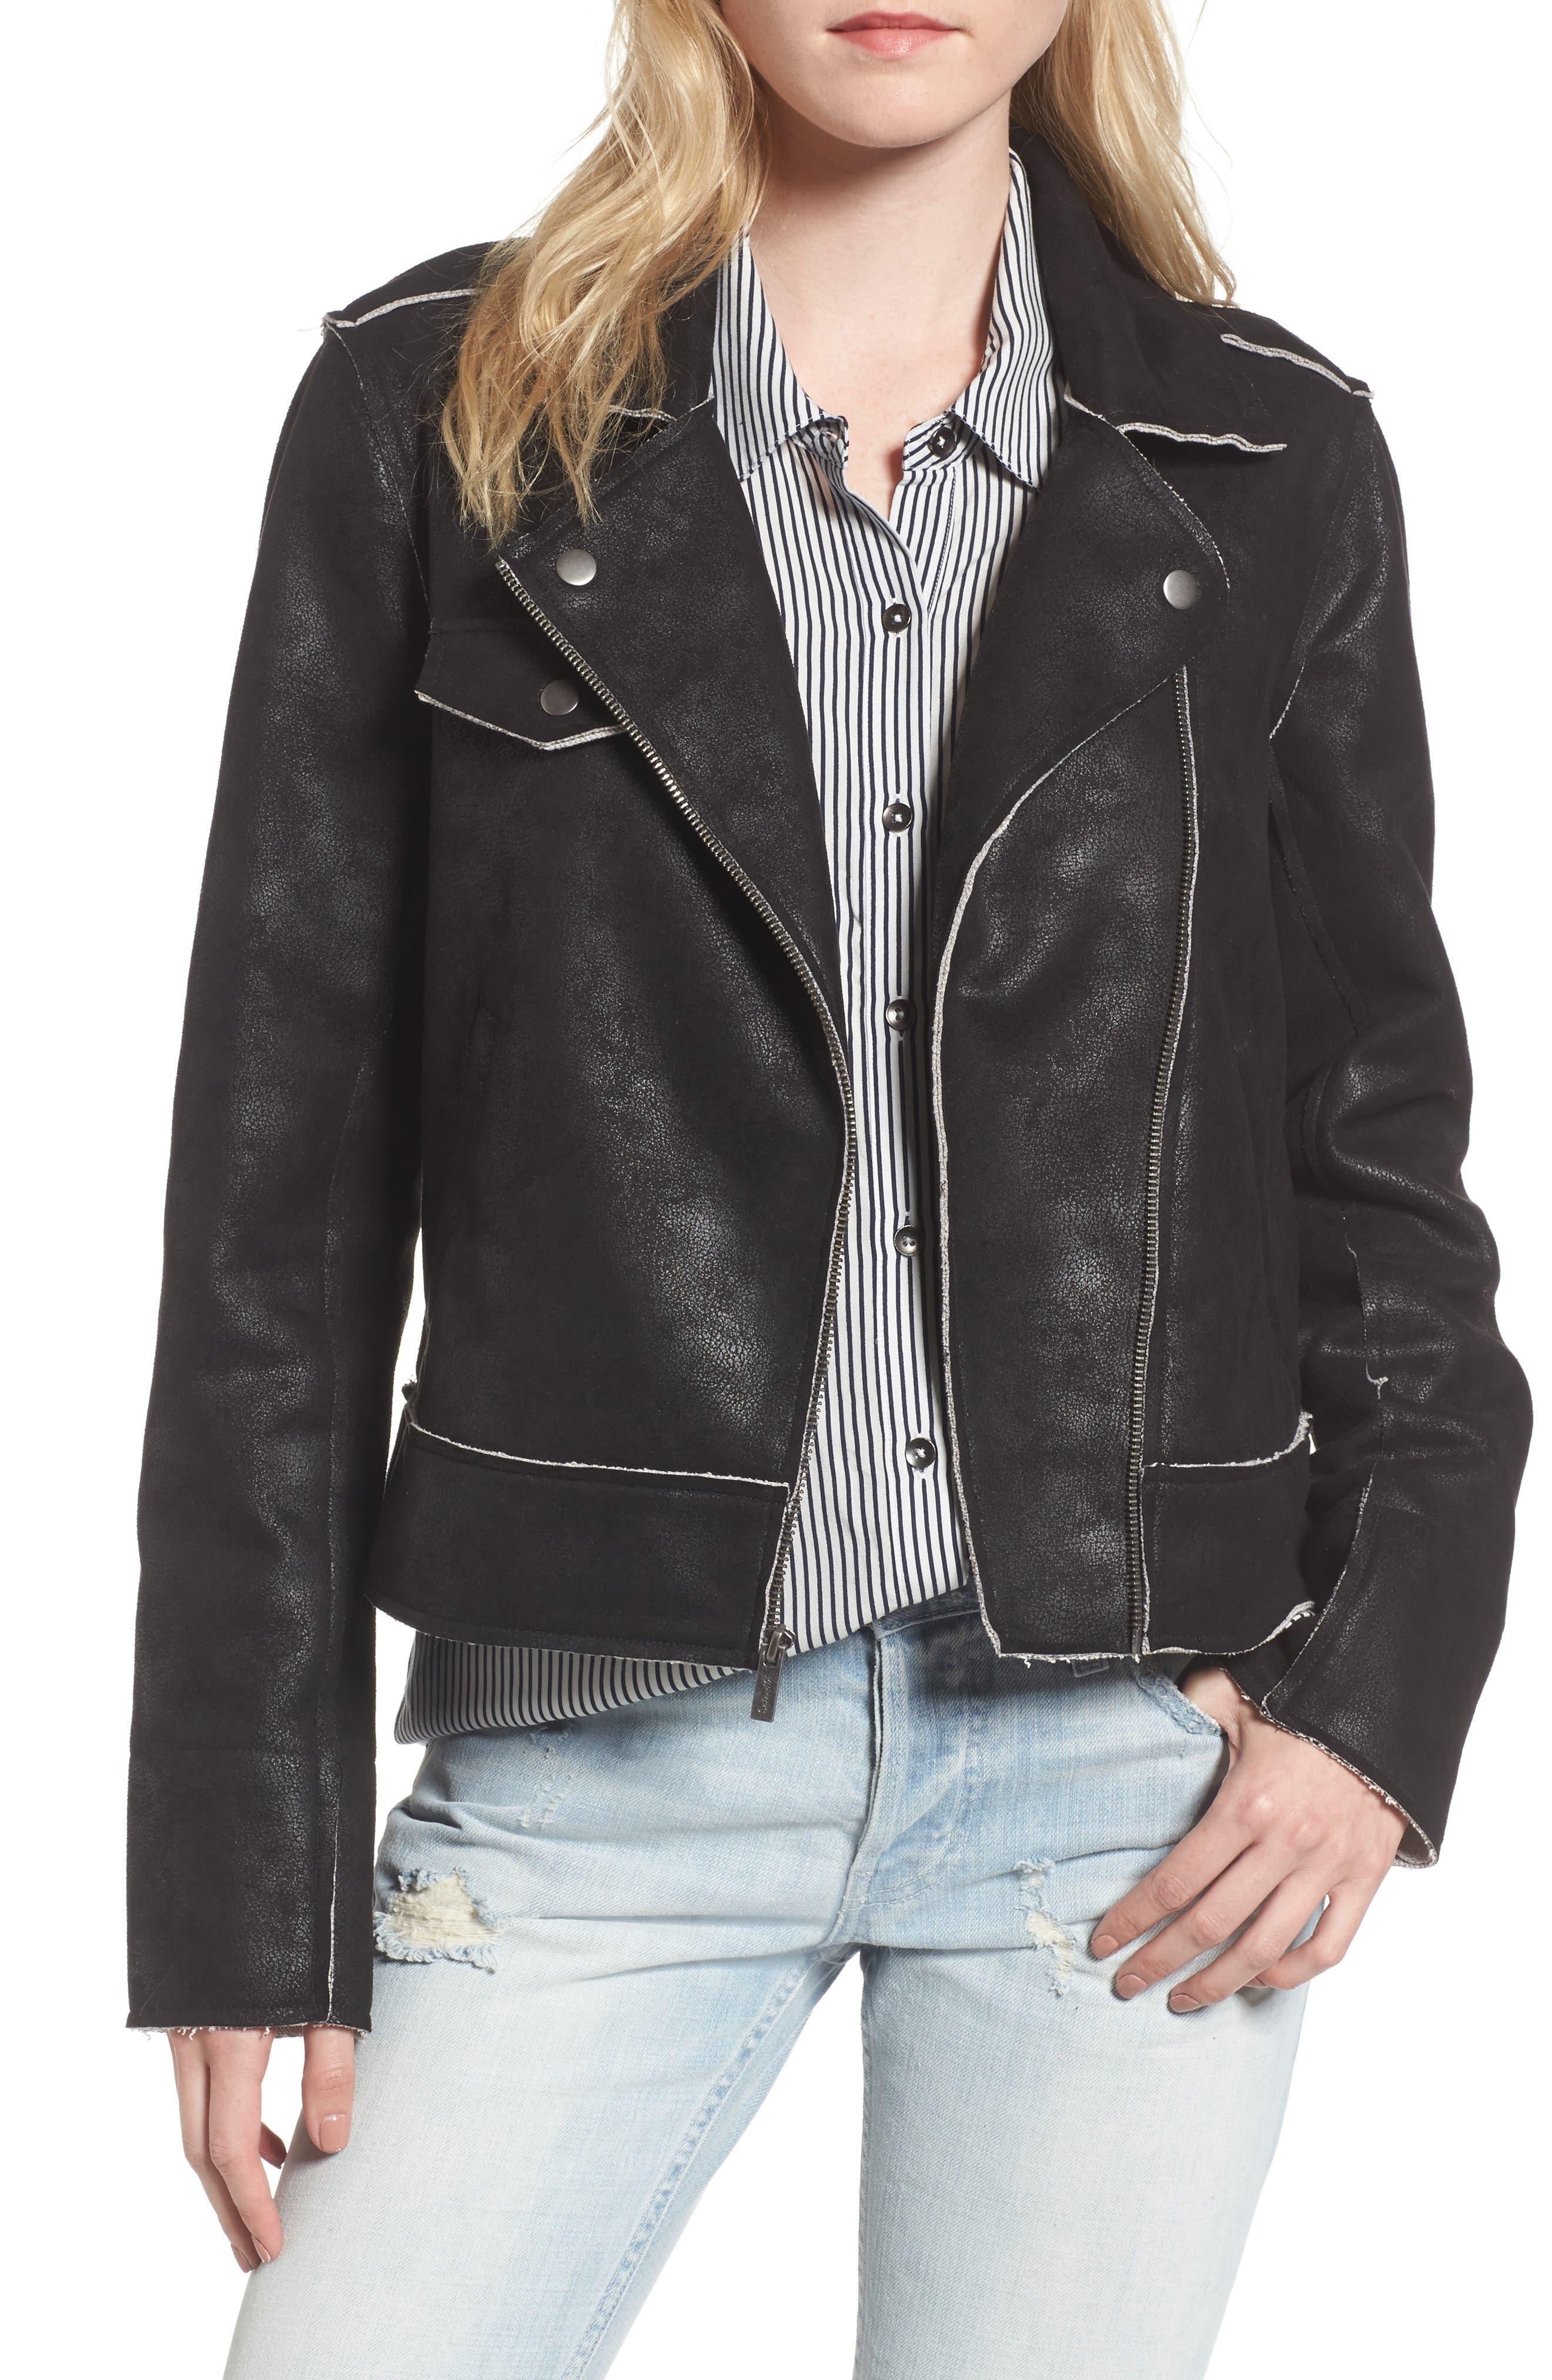 Alternate Image 1 Selected - Splendid Faux Leather Moto Jacket